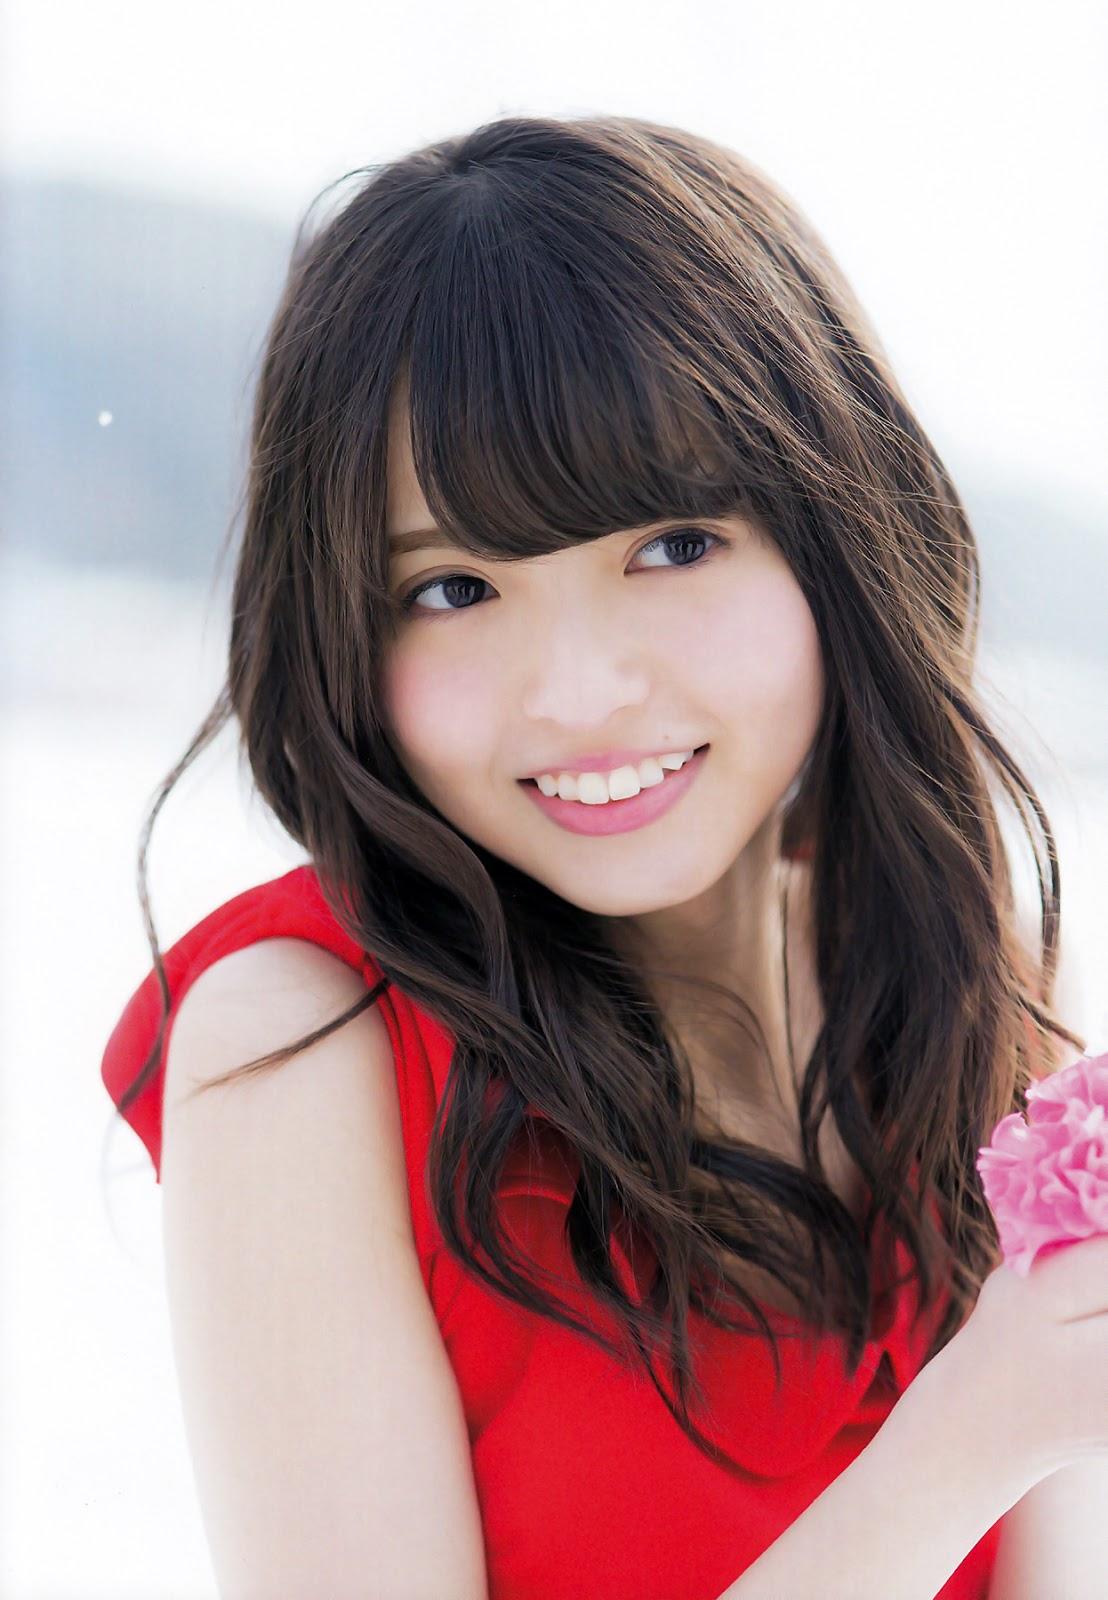 everyday nogizaka46 magazine saito asuka x utb. Black Bedroom Furniture Sets. Home Design Ideas